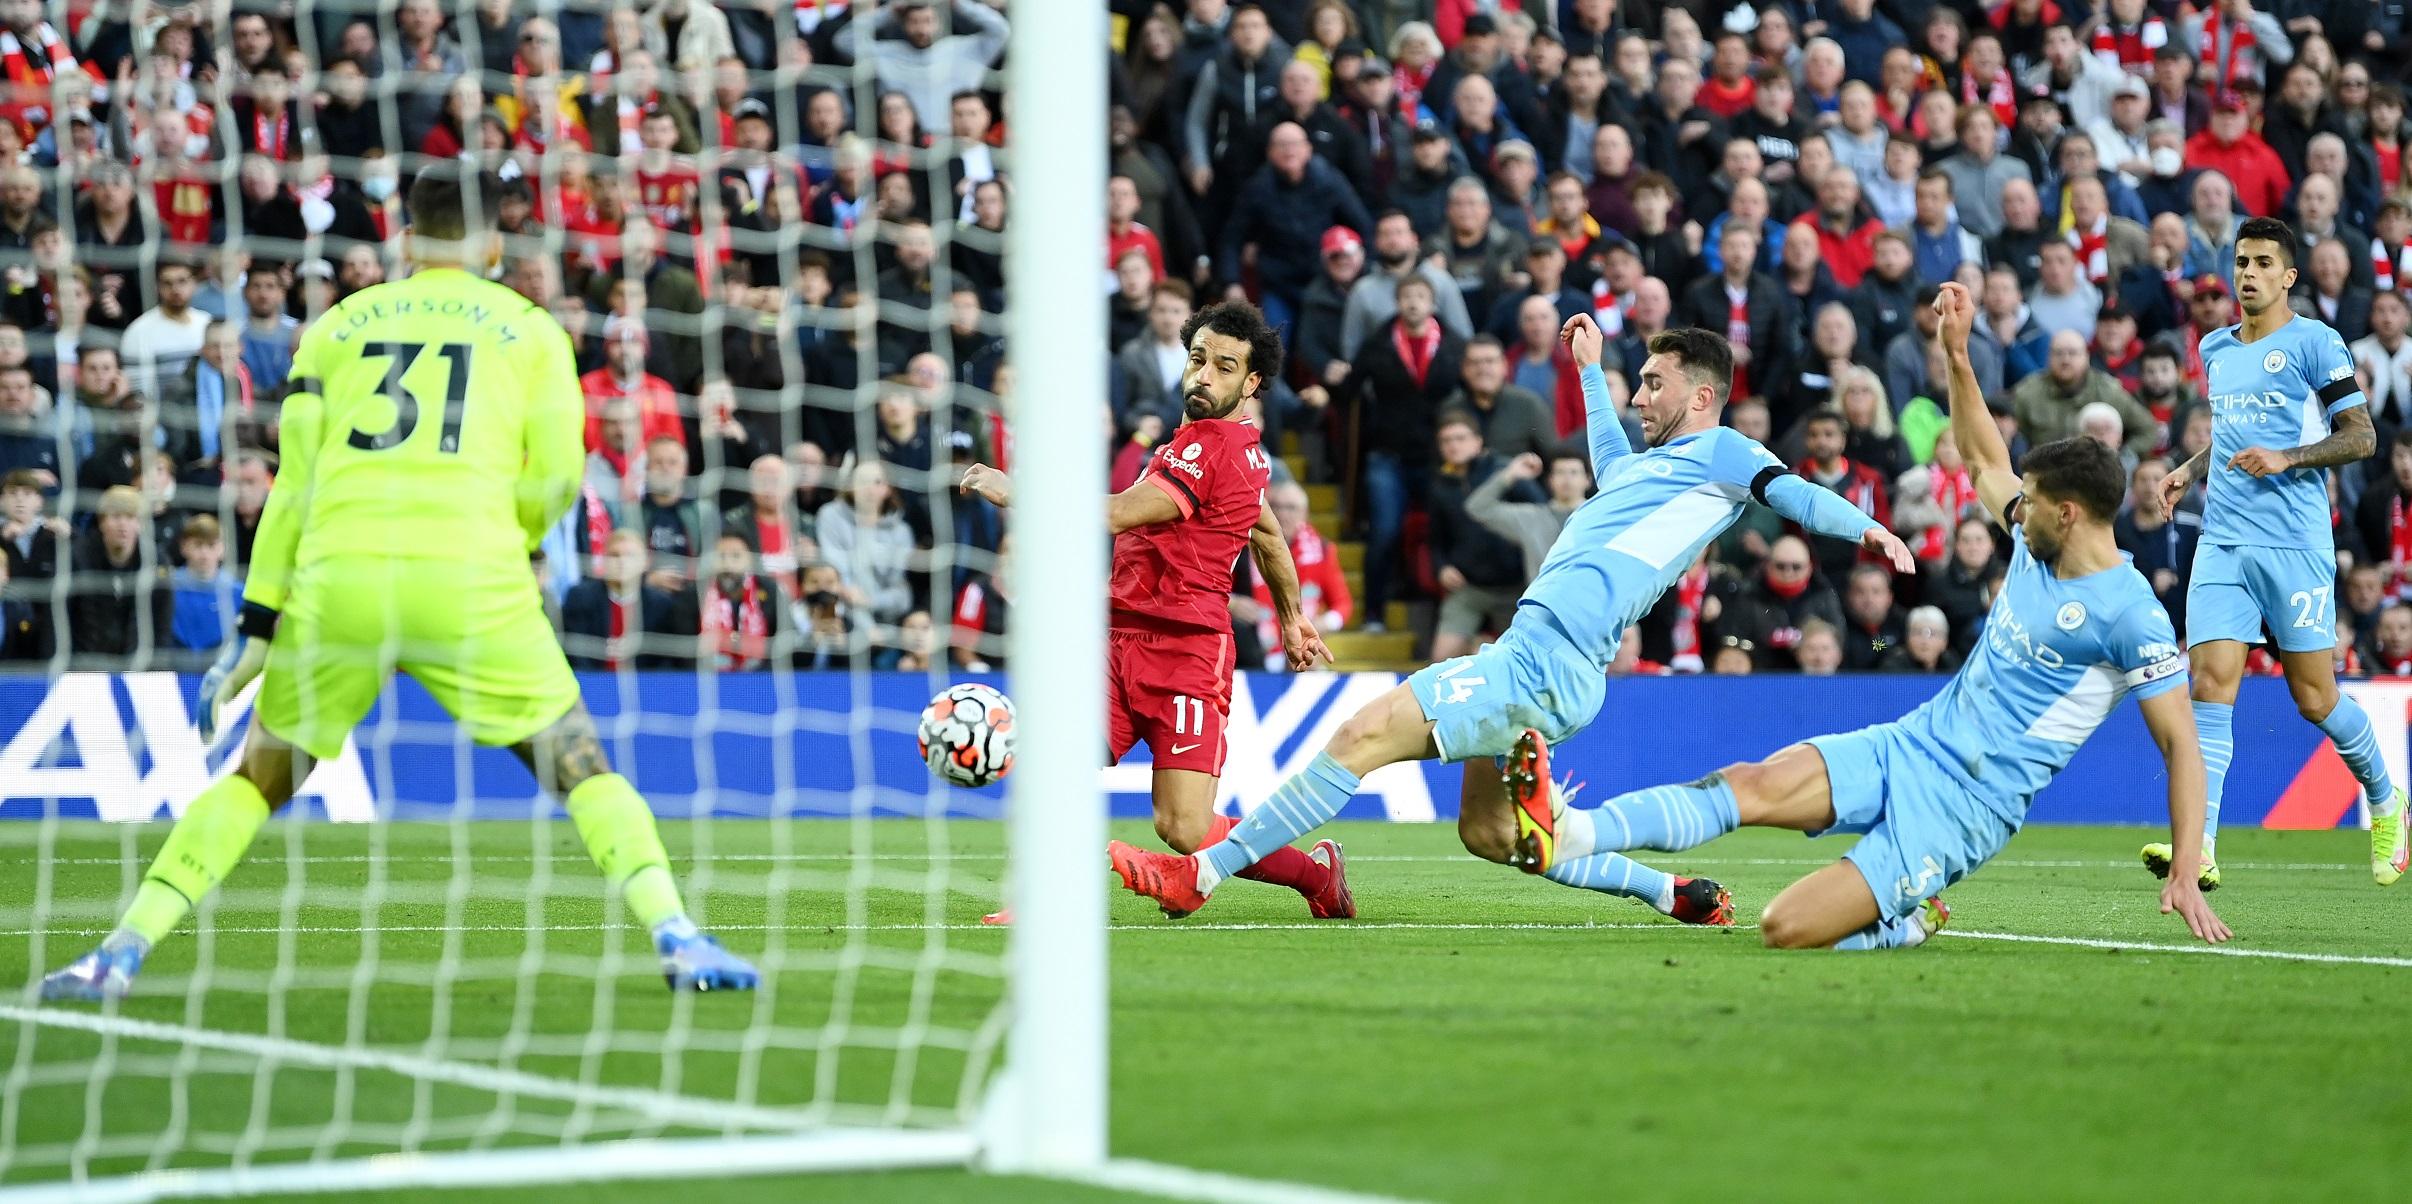 (Video) Mo Salah's remarkable wonder goal from multiple angles